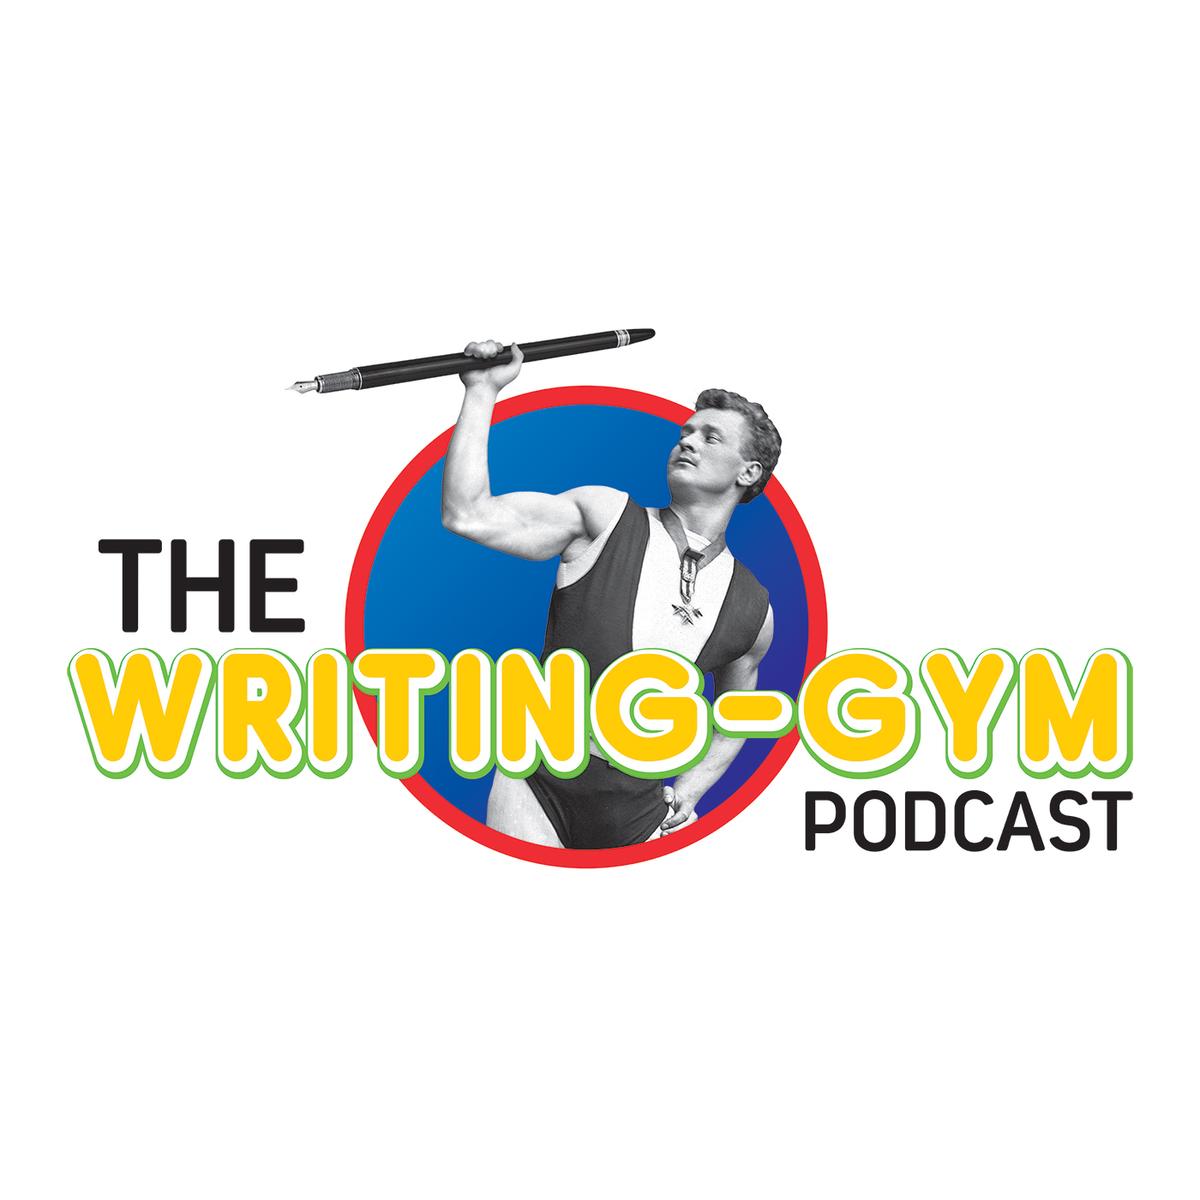 Ep. 141: Quality Writing Goals | Annalisa Parent